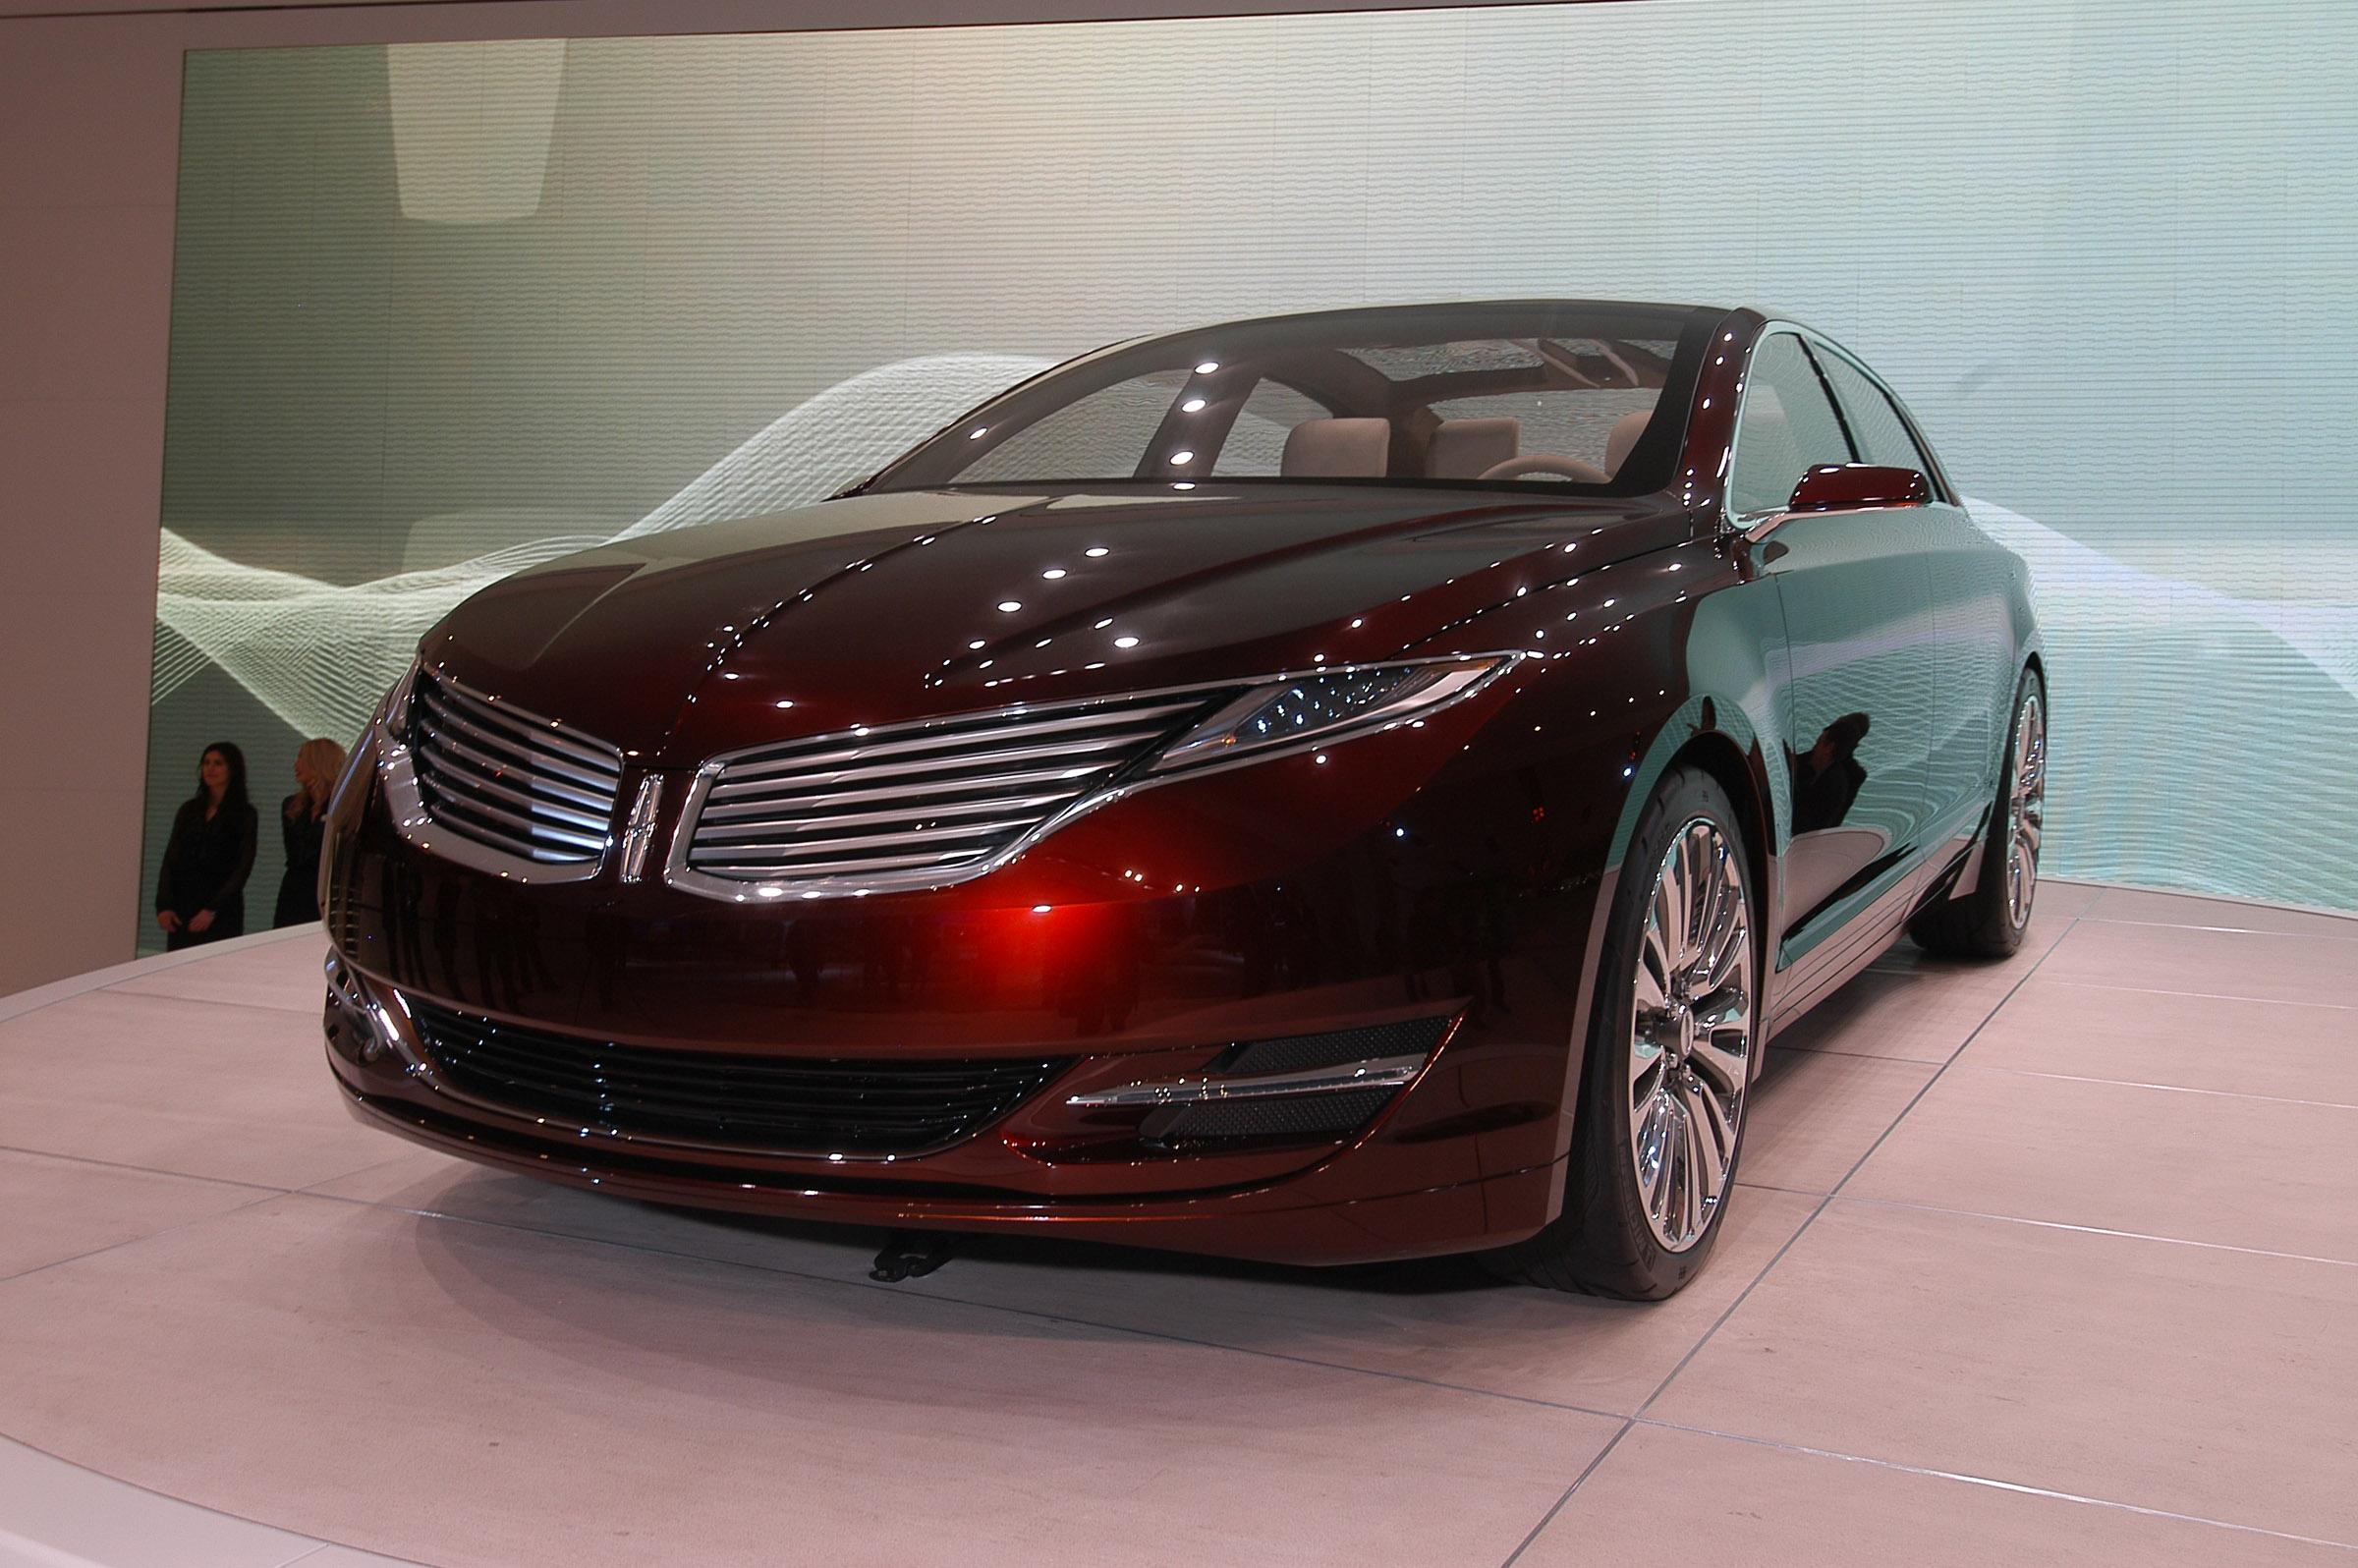 https://www.automobilesreview.com/gallery/lincoln-mkz-concept-detroit-2012/lincoln-mkz-concept-detroit-2012-03.jpg